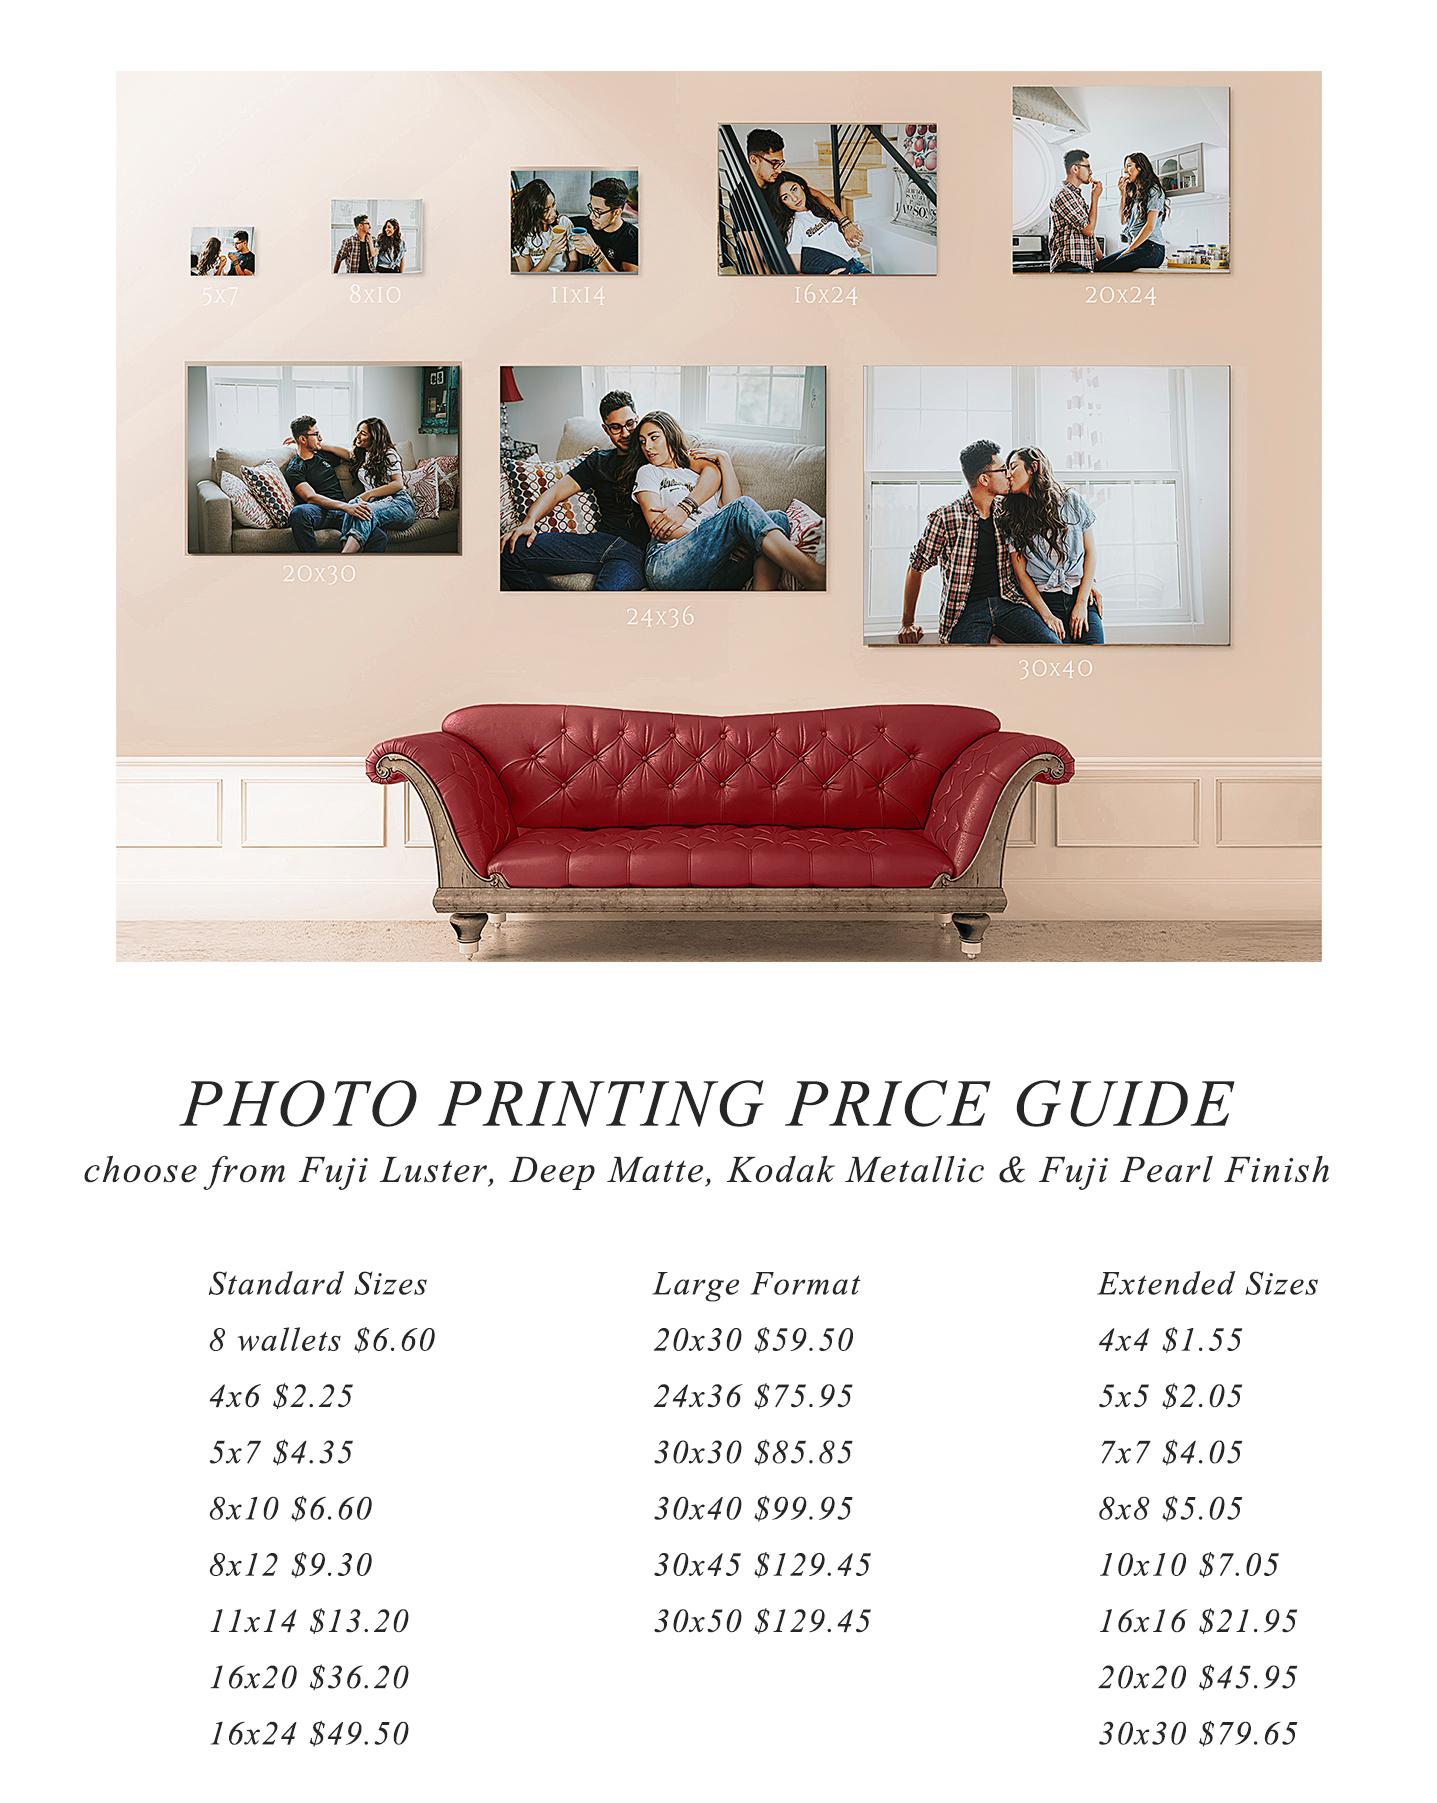 photo printing2.jpg